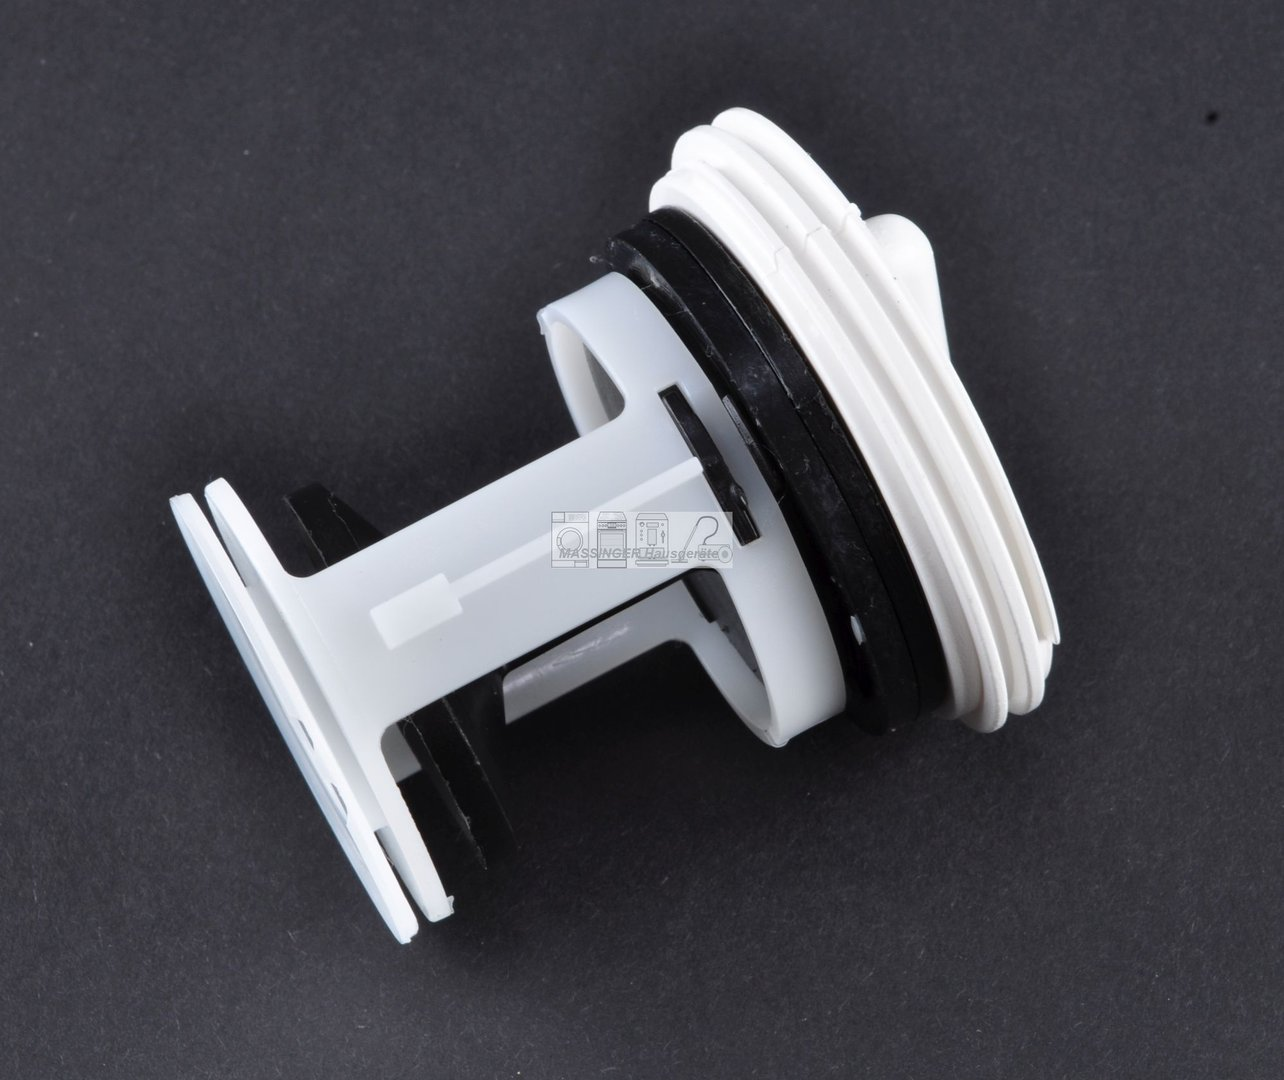 aeg flusensieb flusenfilter falle f r waschmaschine 4006016556. Black Bedroom Furniture Sets. Home Design Ideas